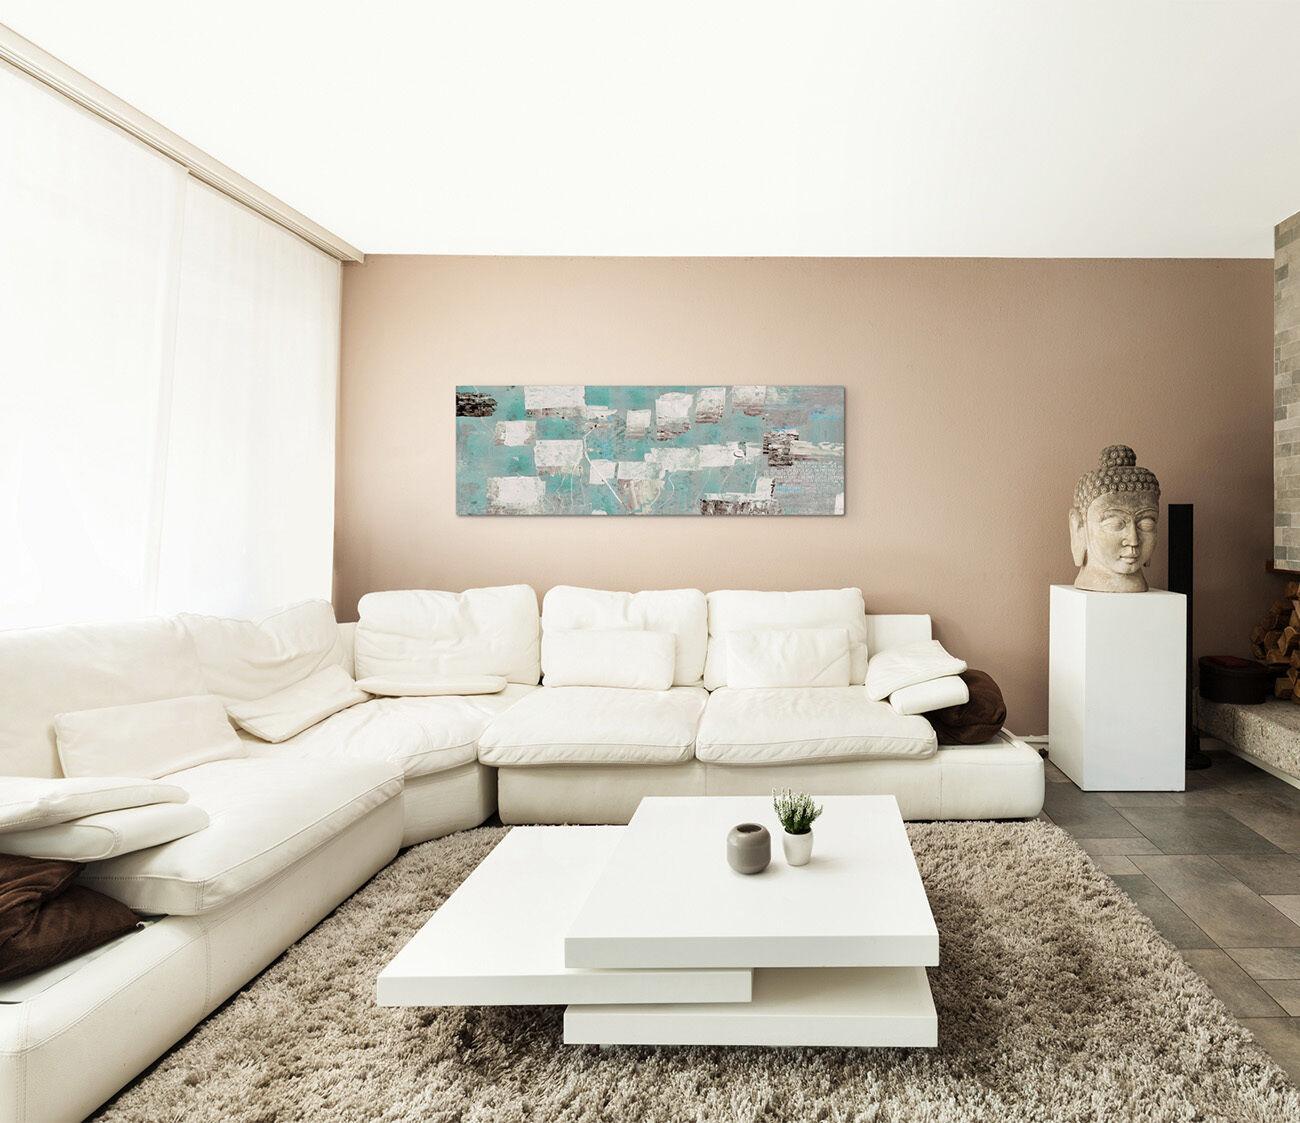 leinwandbild panorama grau t rkis schwarz beige paul sinus. Black Bedroom Furniture Sets. Home Design Ideas